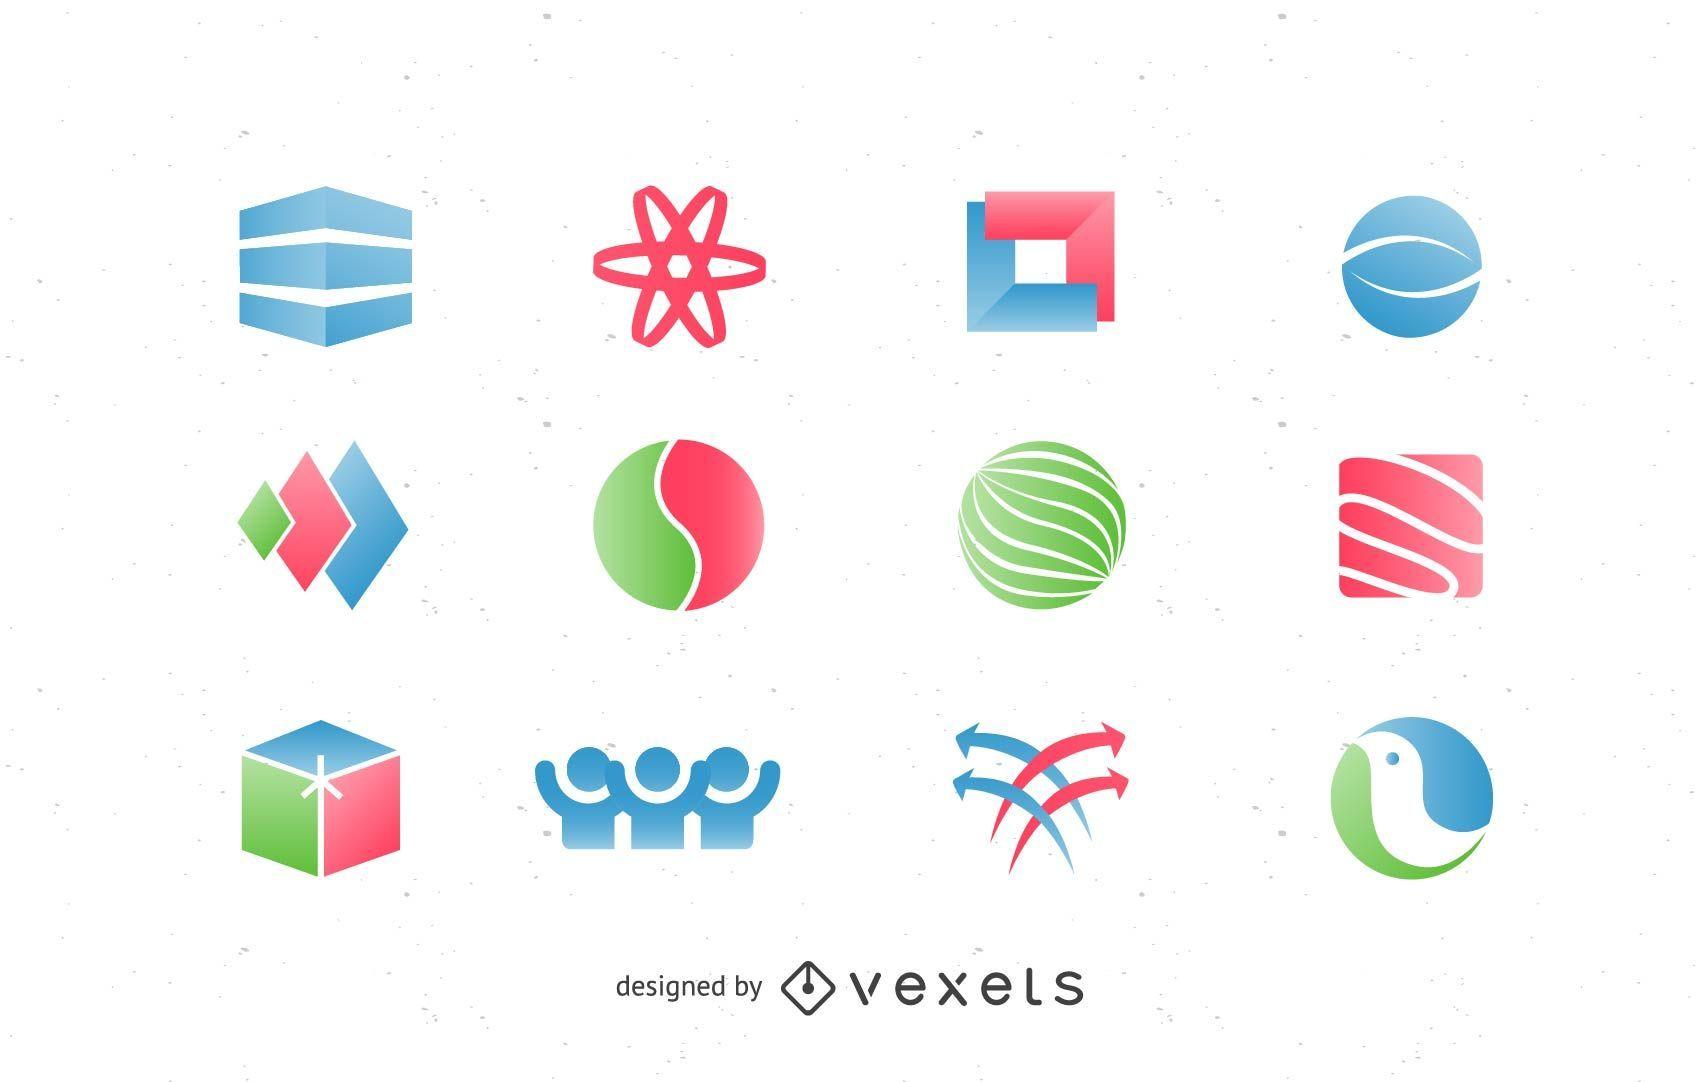 Elementos do logotipo do pacote